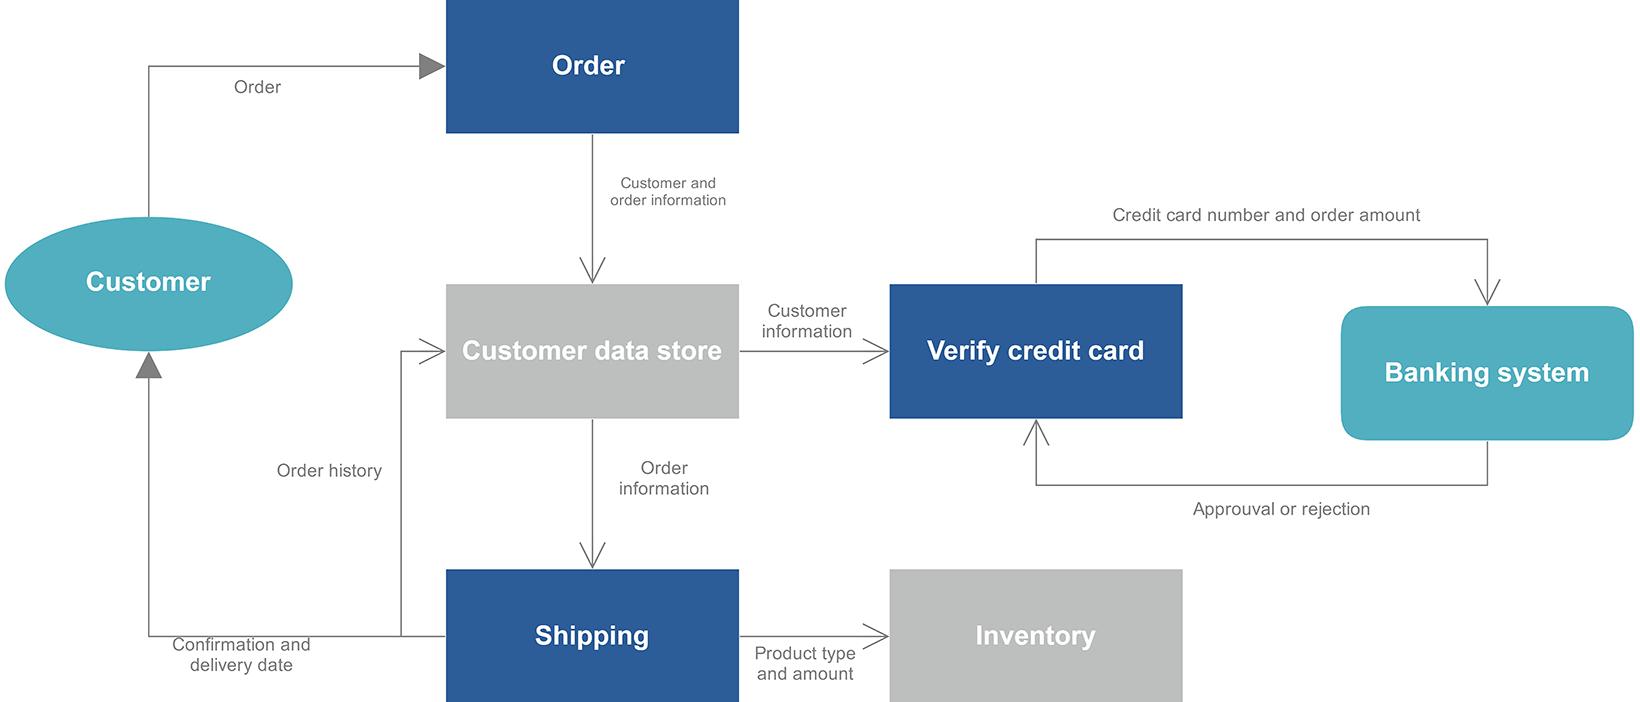 Data Flow Diagram Dfd Maker Online Free Data Flow Diagram Maker For Teams